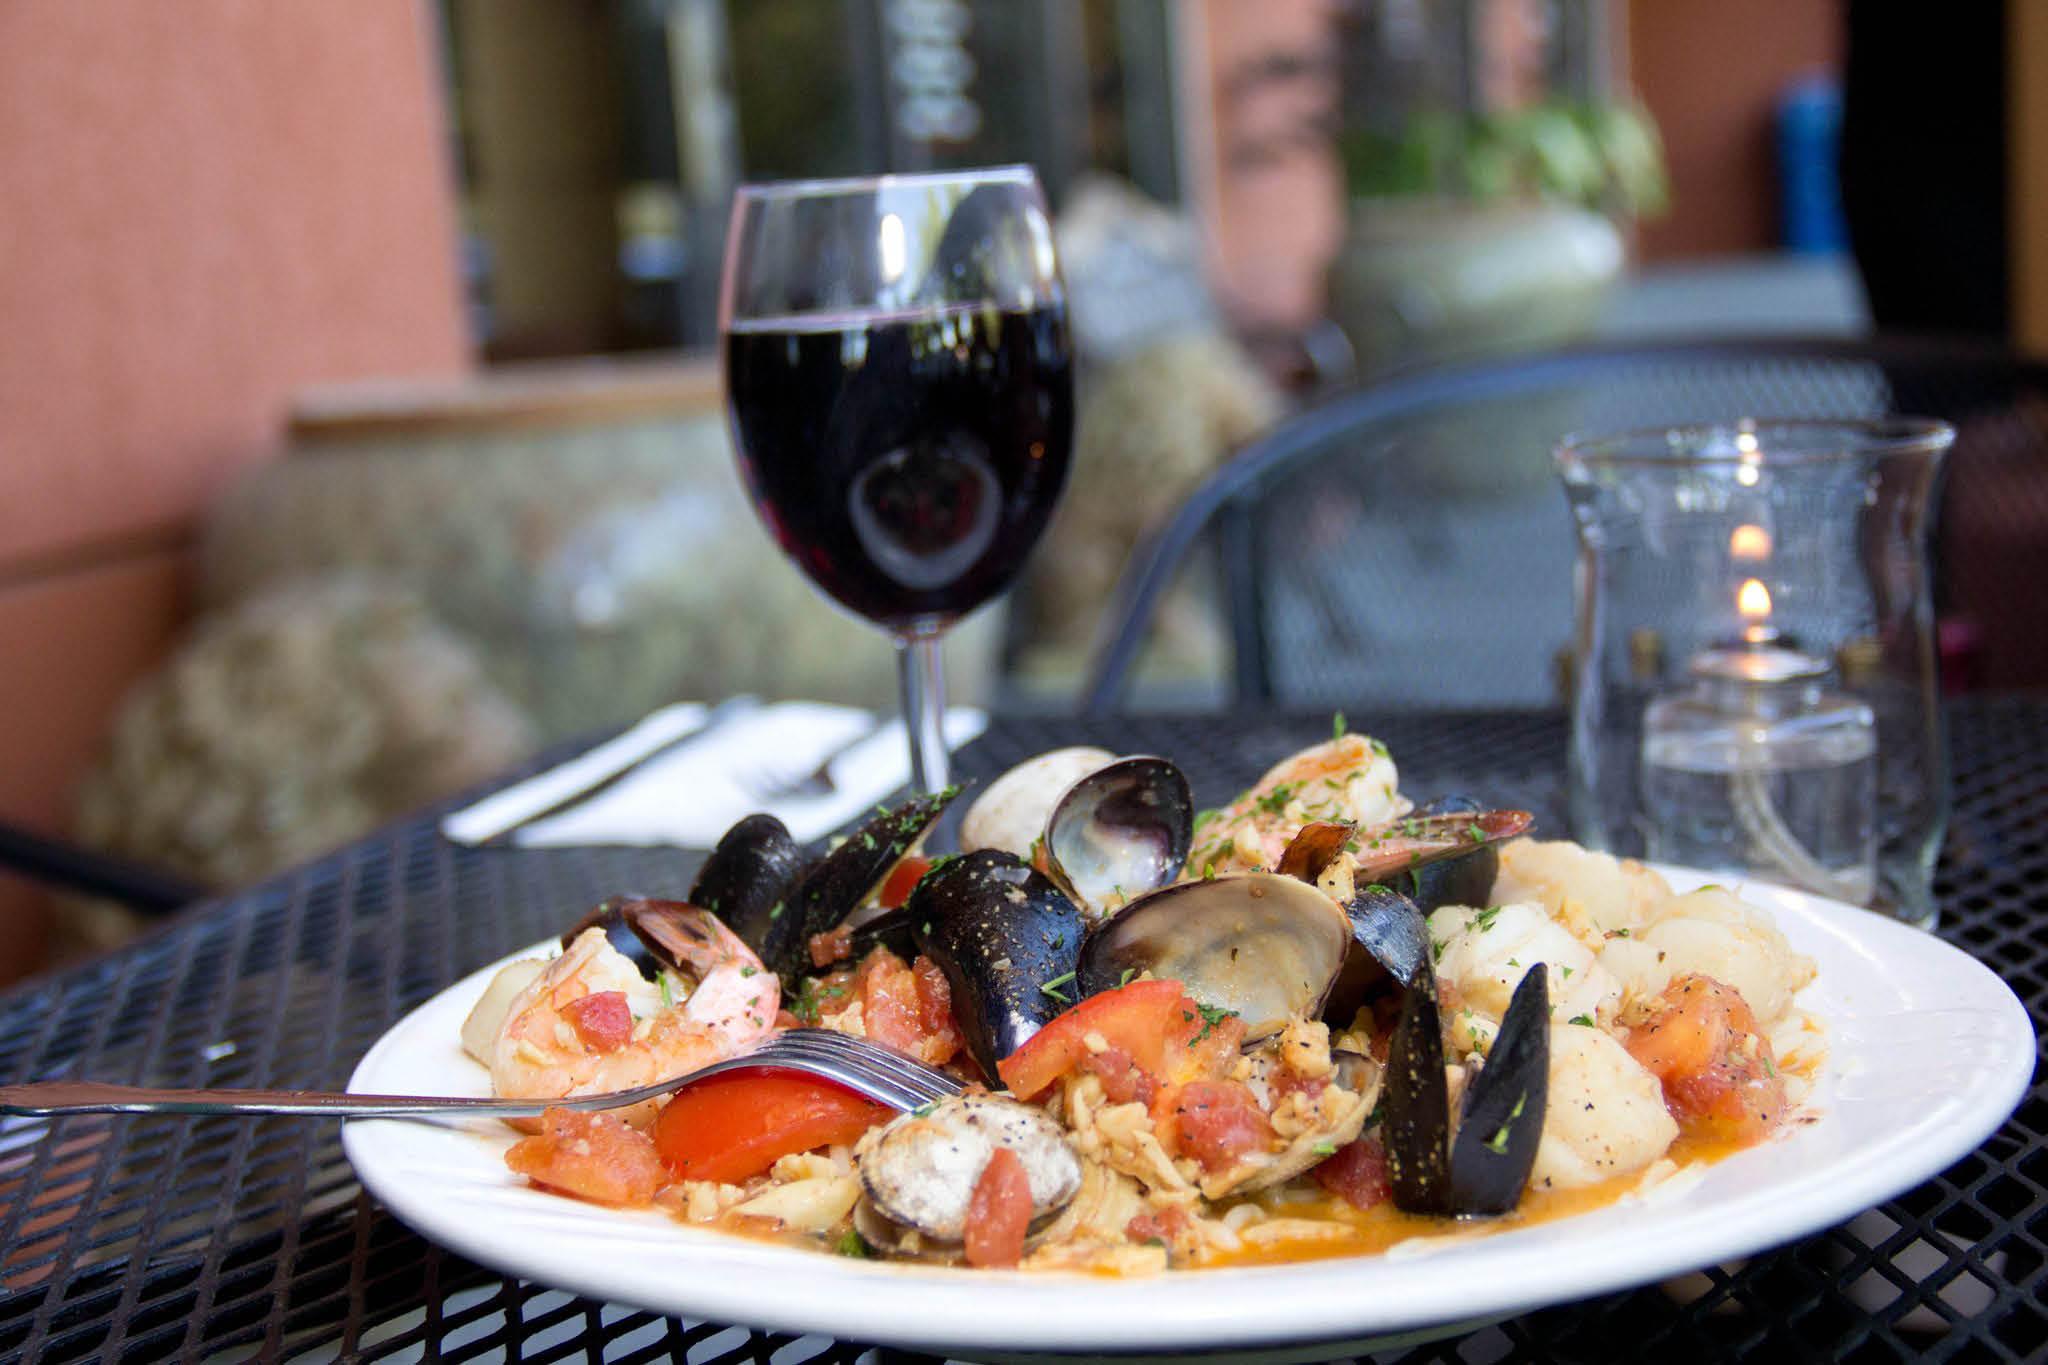 Romeo's Restaurant & Pizzeria - Edmonds, WA - Delicious seafood and wine